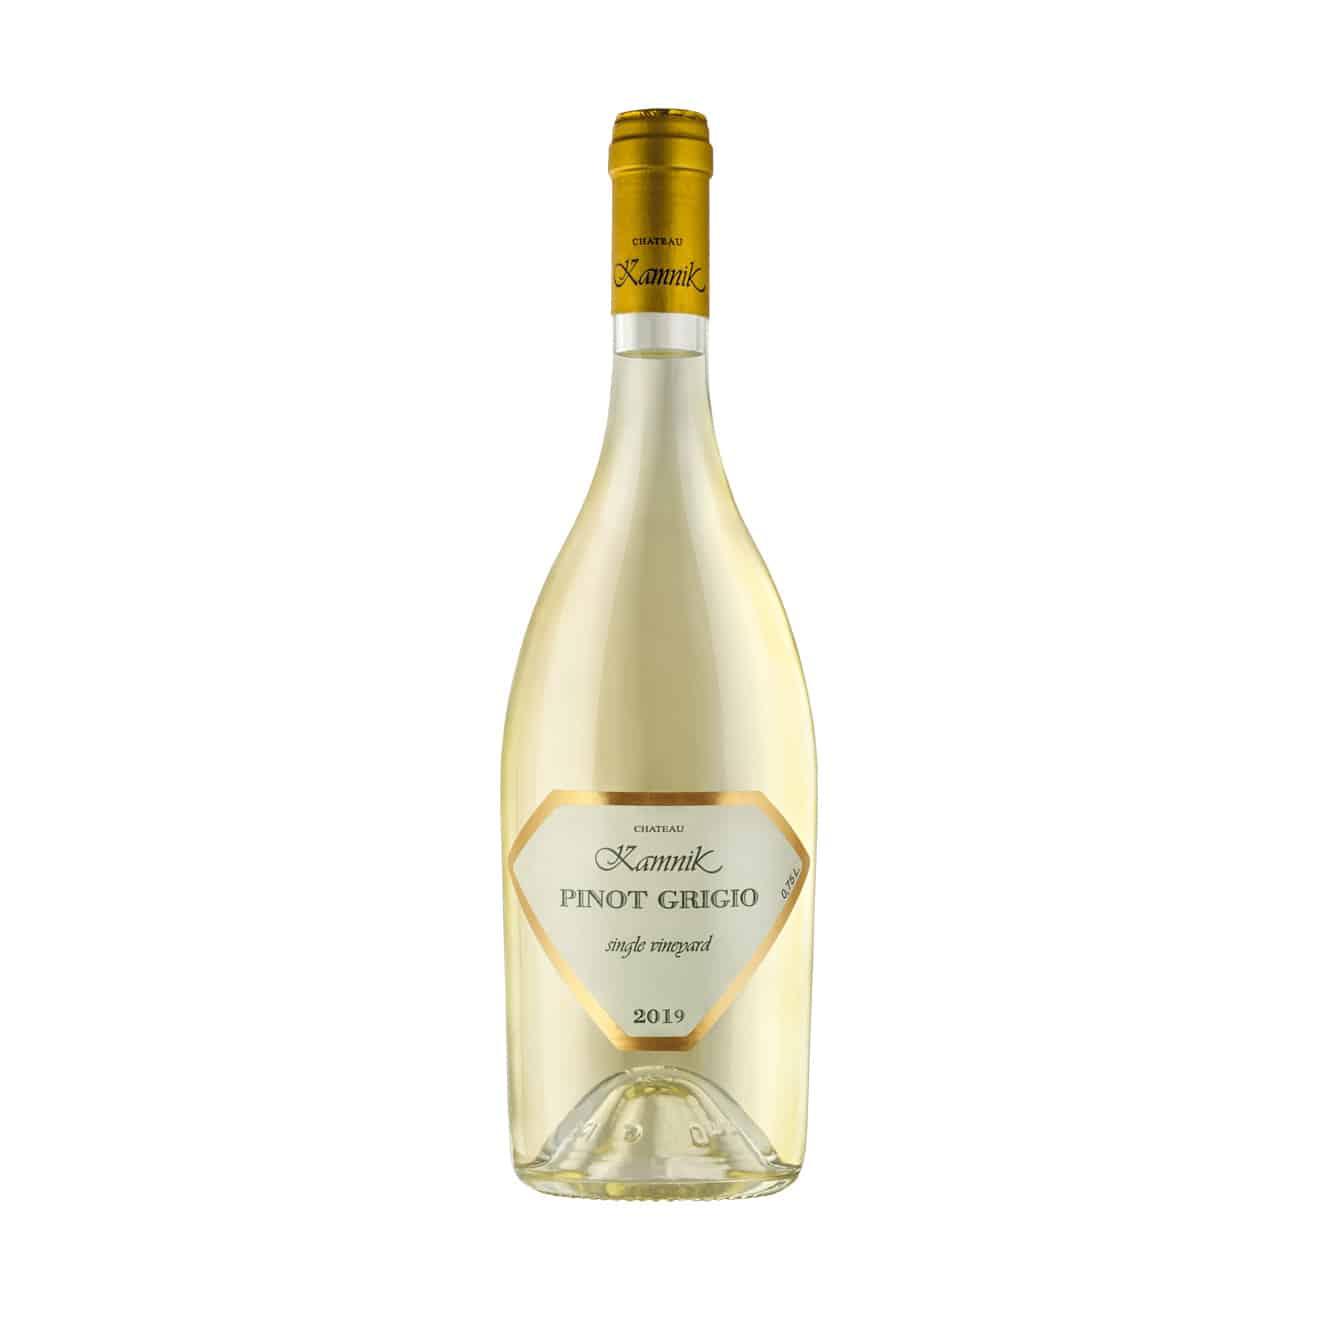 Chateau Kamnik Pinot Grigio Single Vineyard 2019